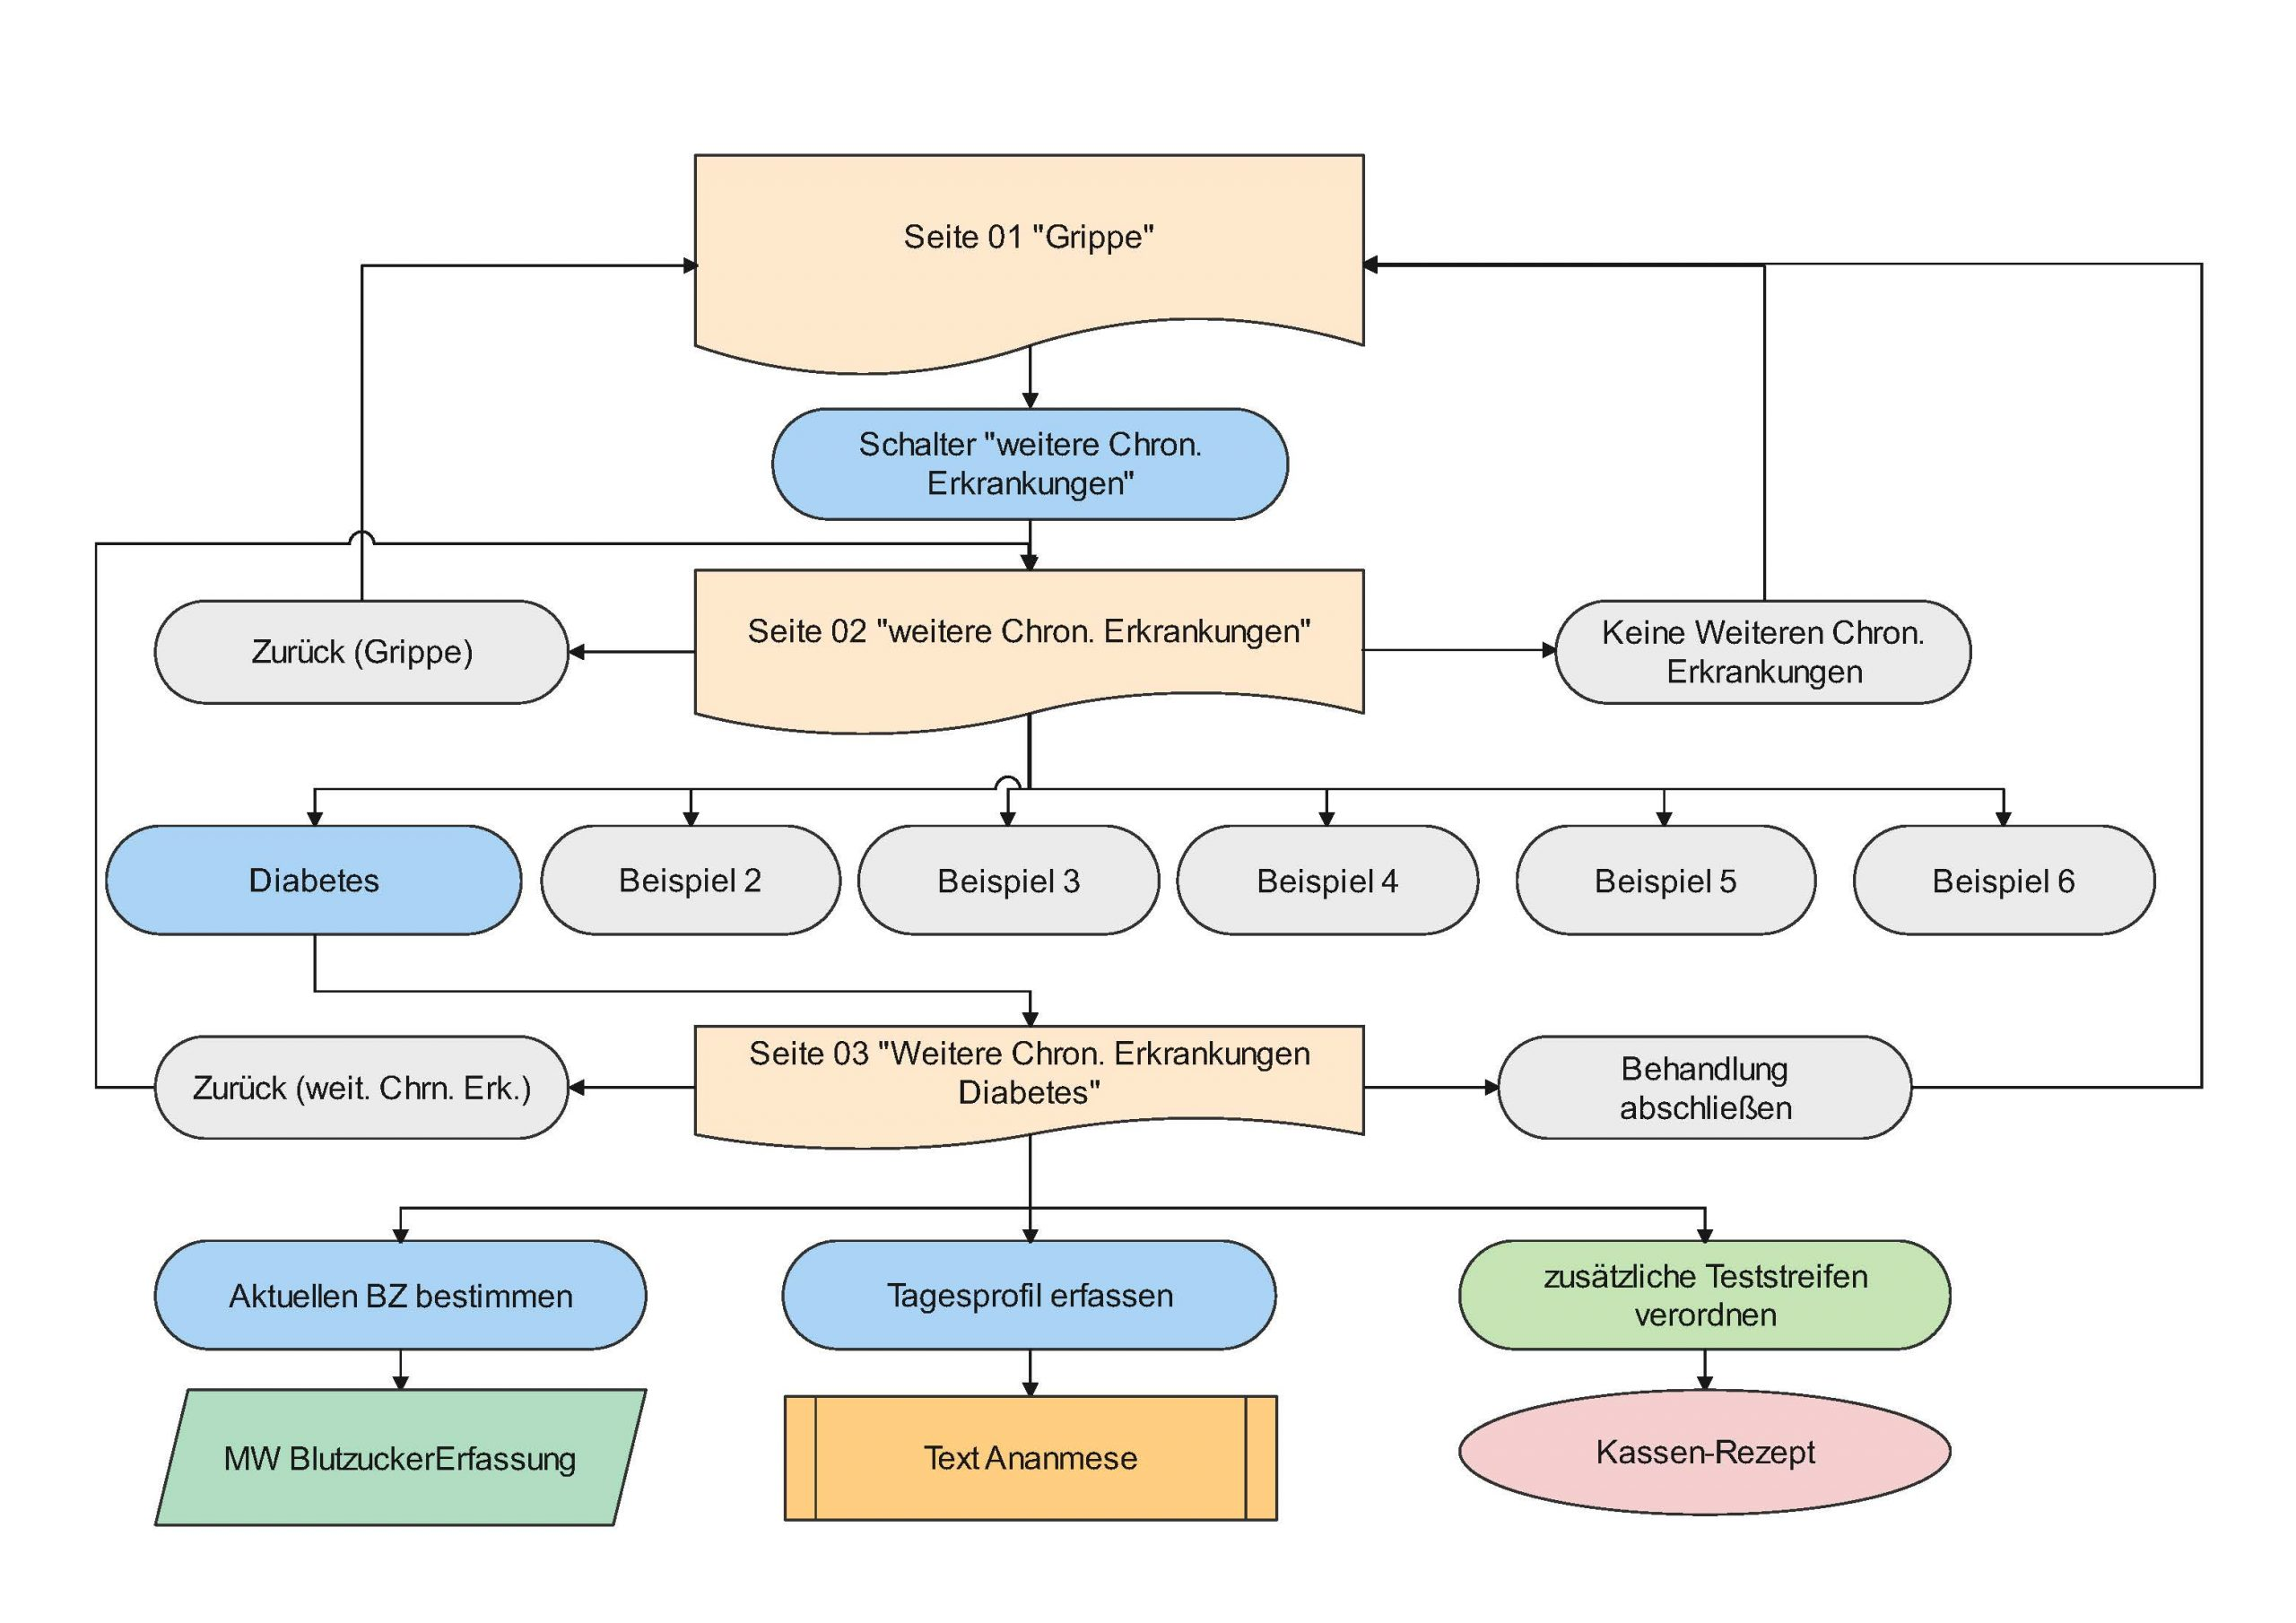 Praxissoftware MEDICAL OFFICE Dr. Ney Dokumentationsassistent